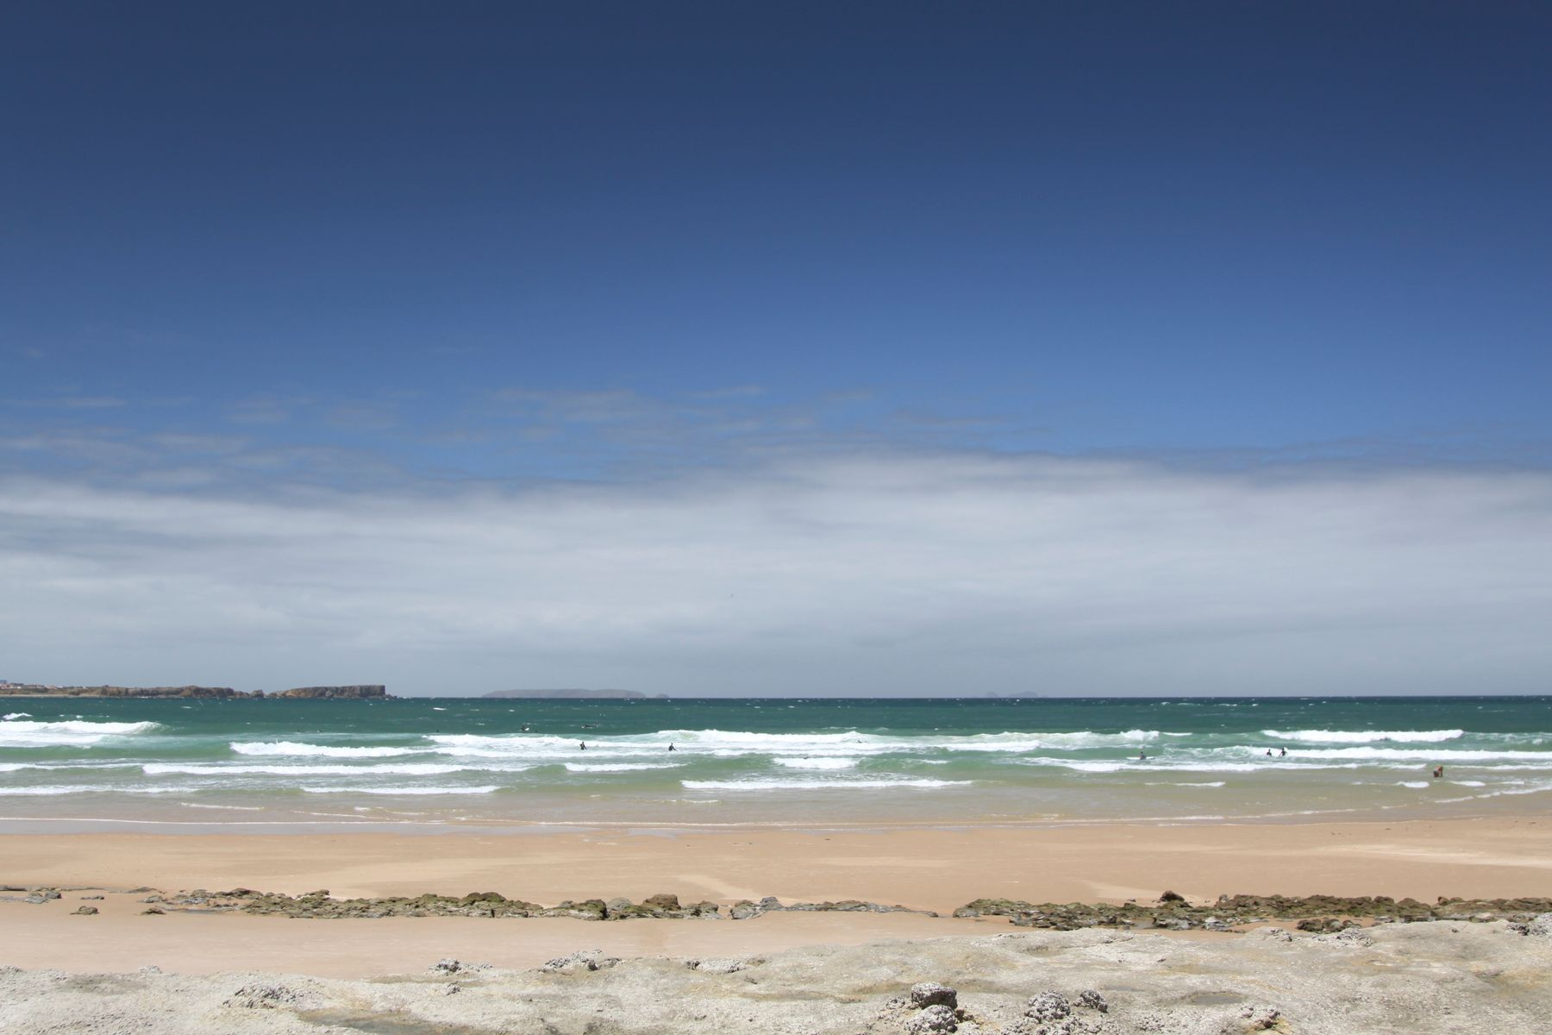 The golden sands of Peniche beach, Portugal